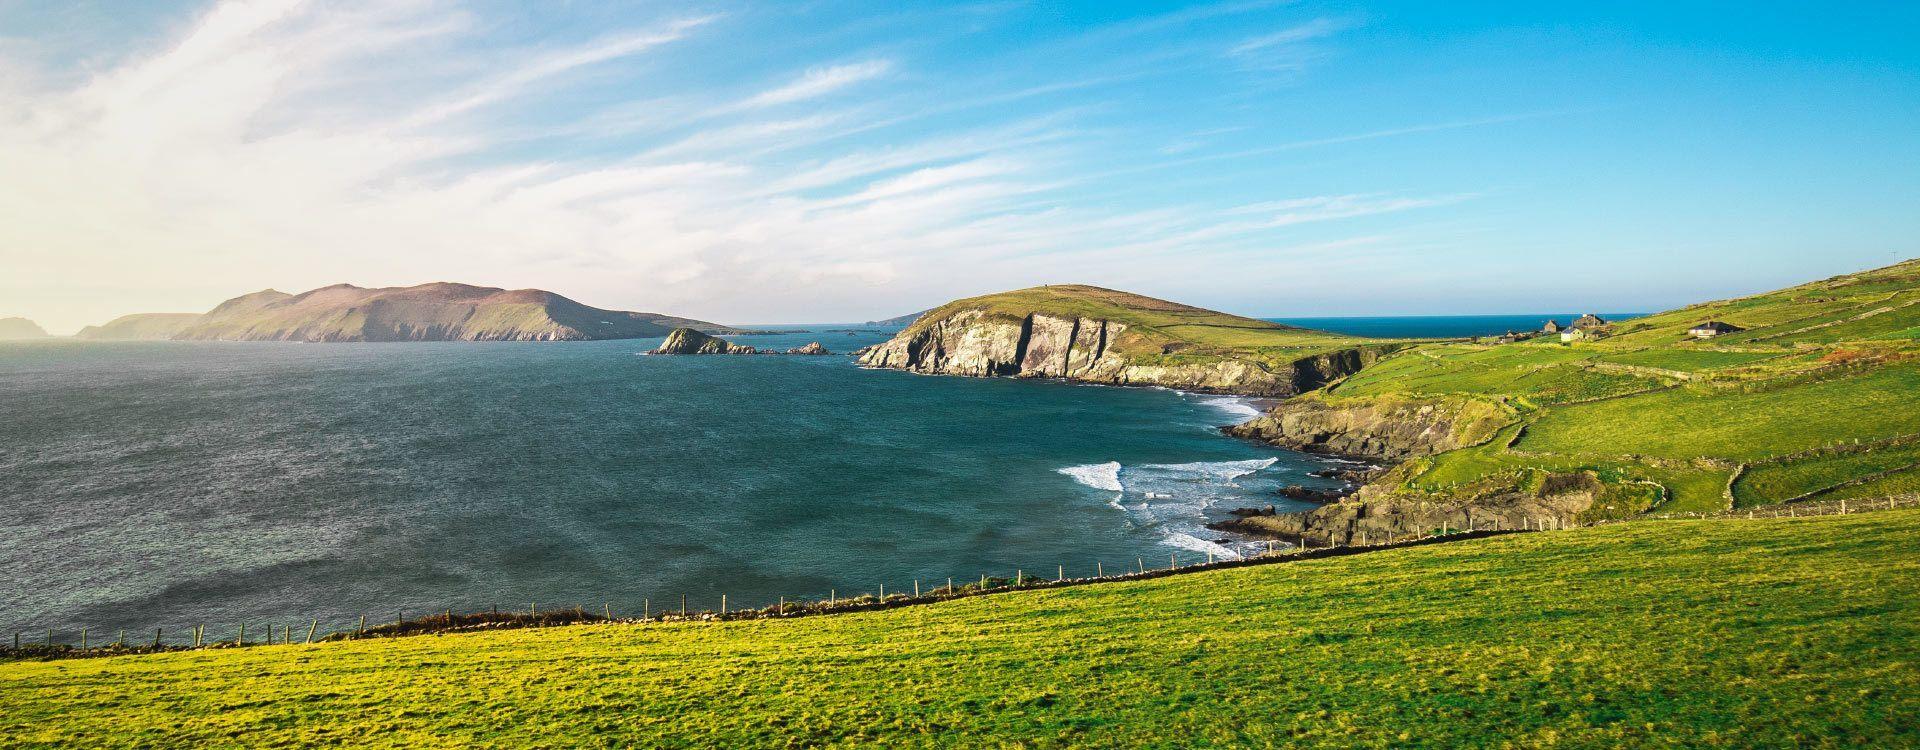 Excursión de un día a Dingle desde Cork